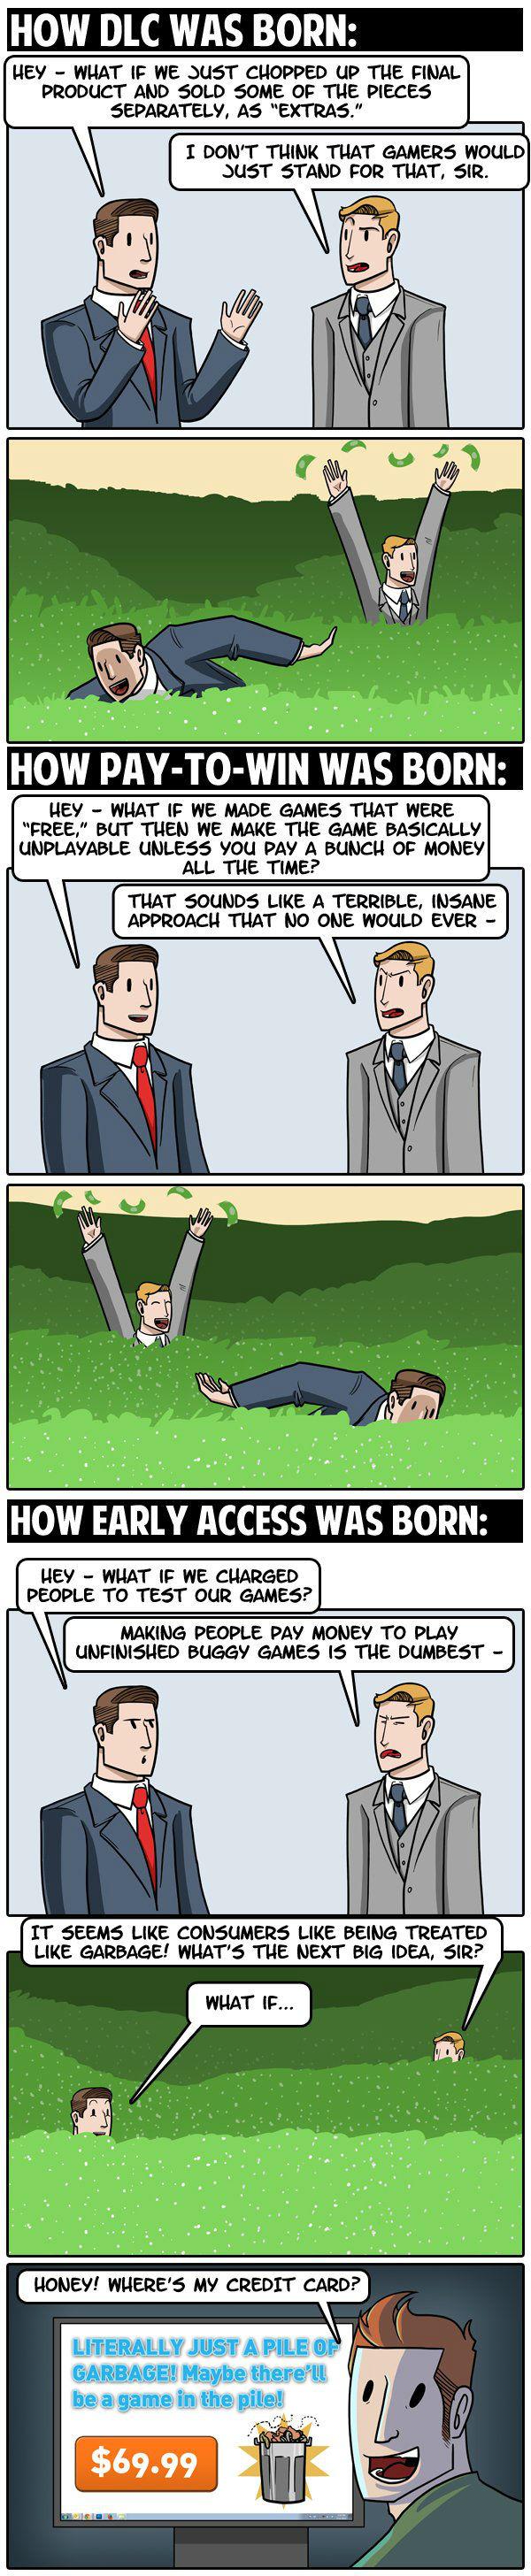 How DLC Was Born